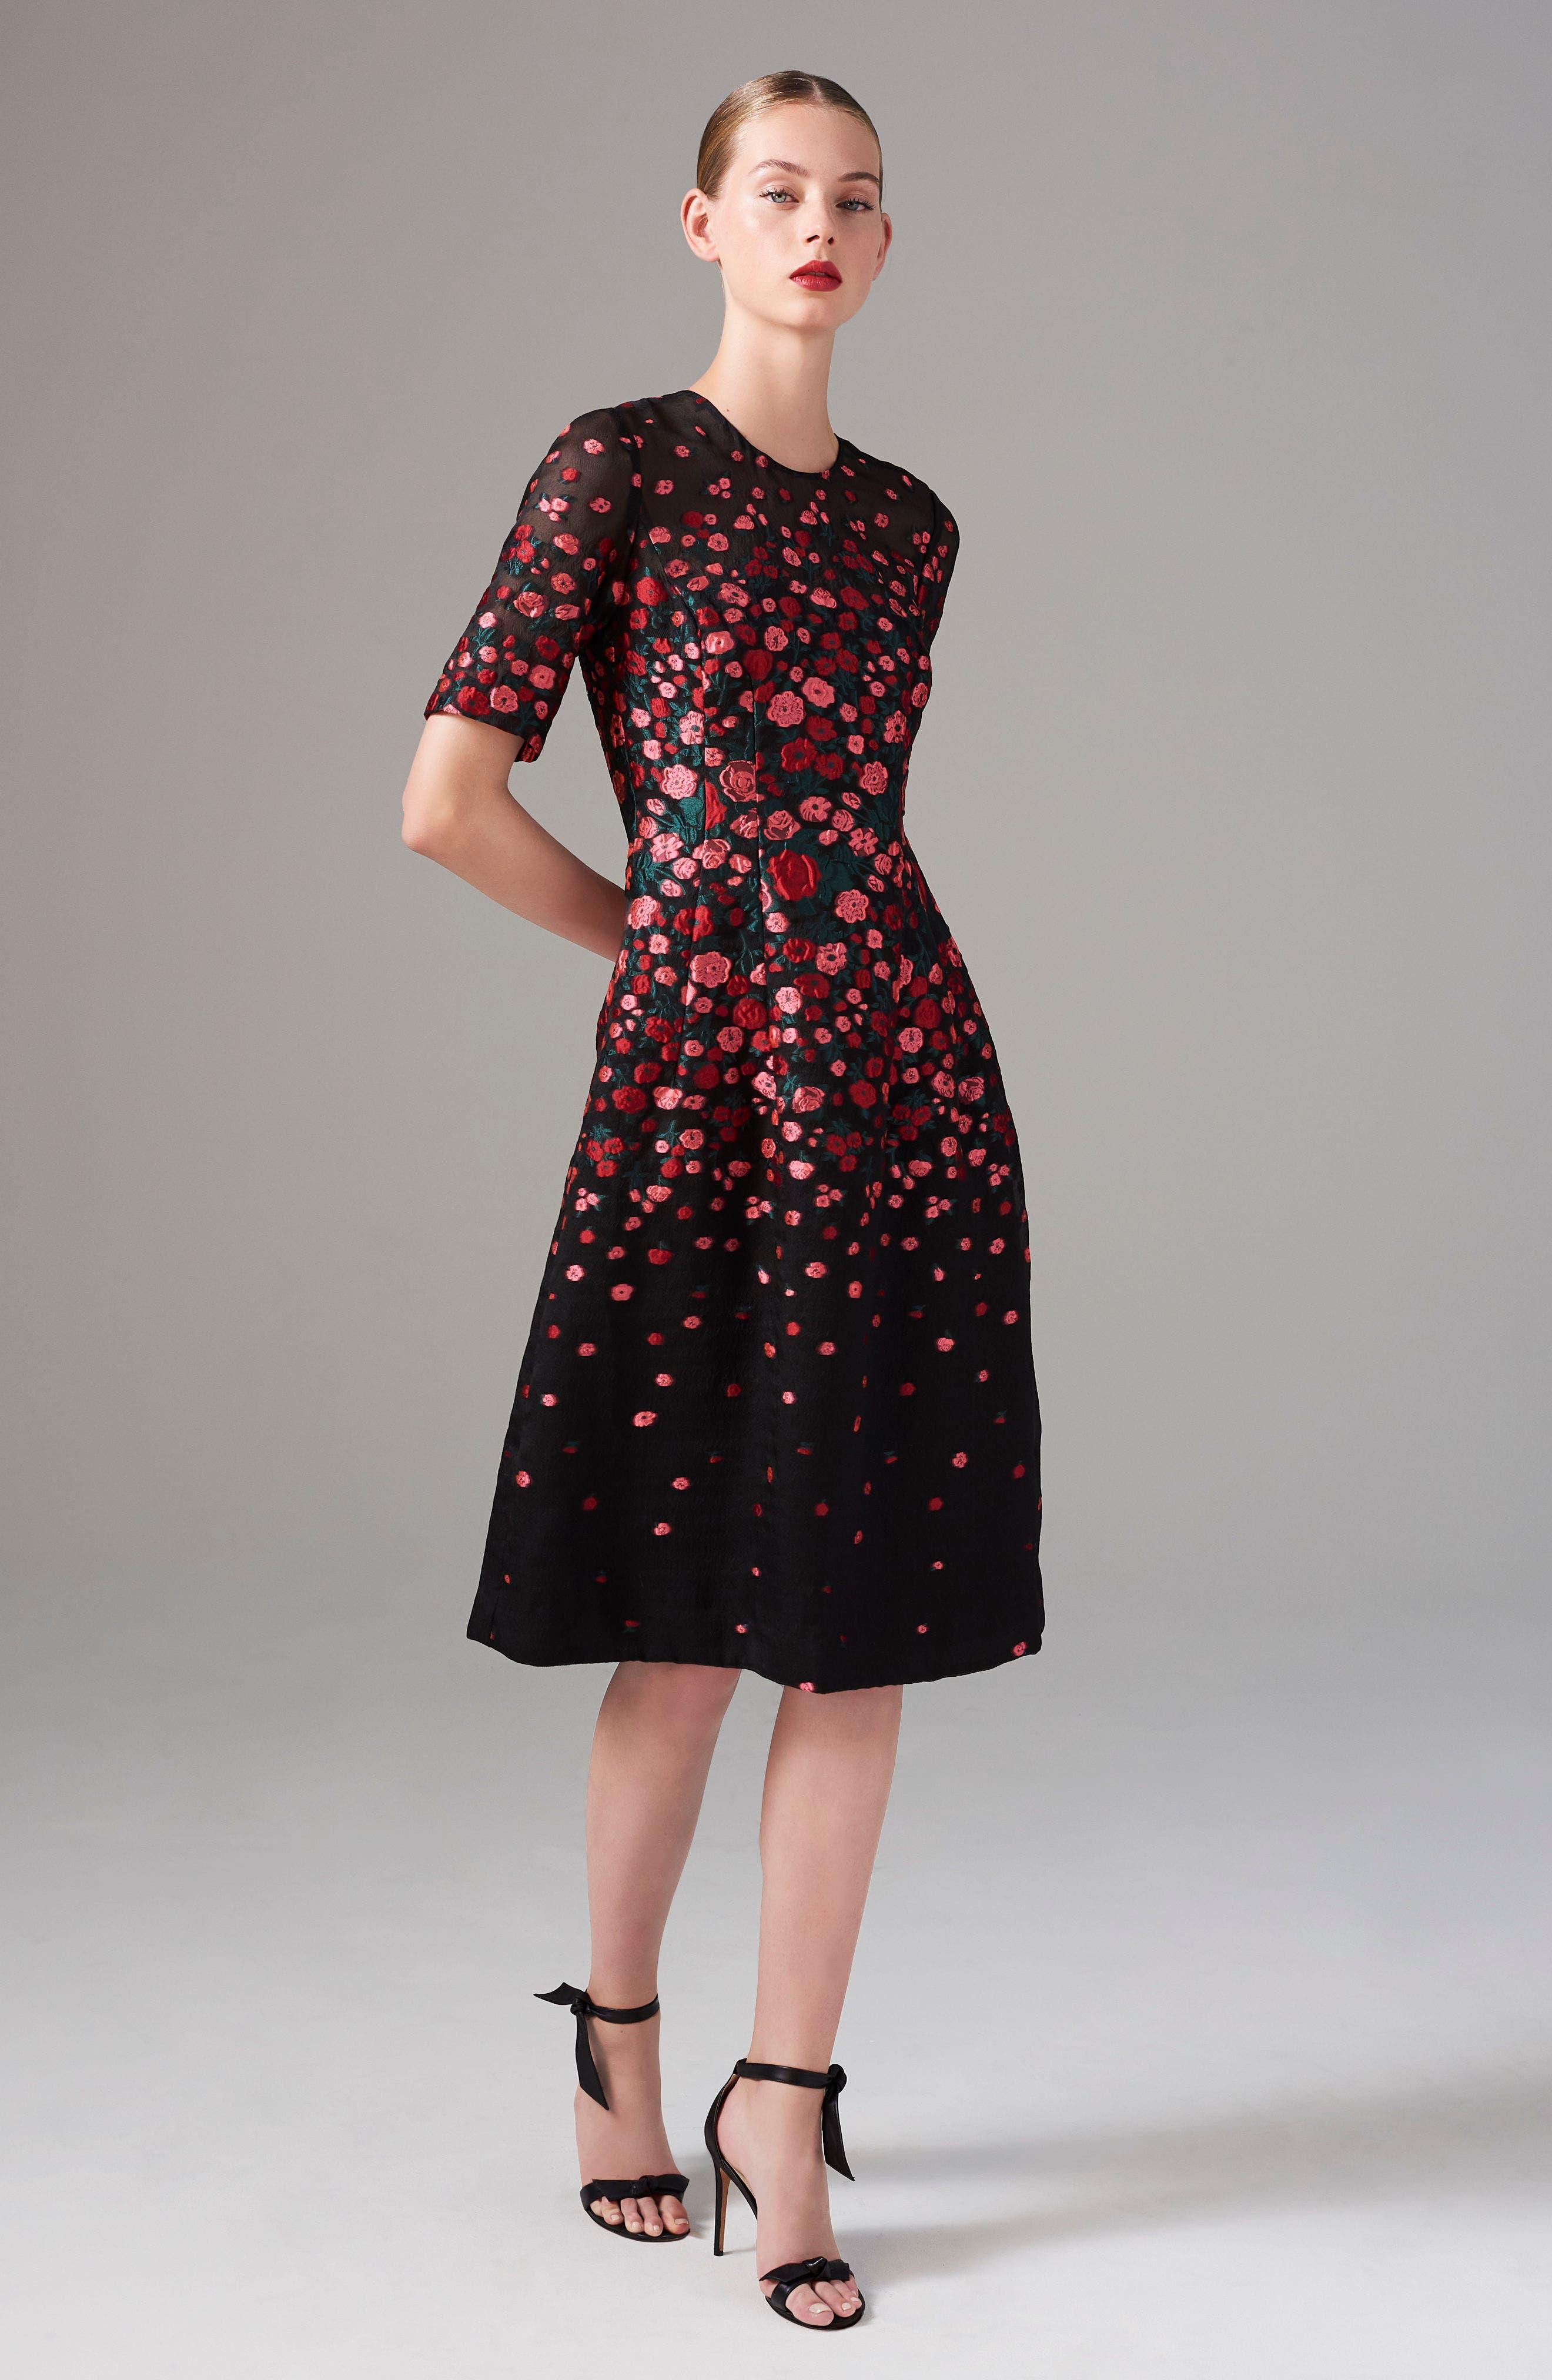 Floral Print Fit & Flare Dress,                             Alternate thumbnail 8, color,                             621